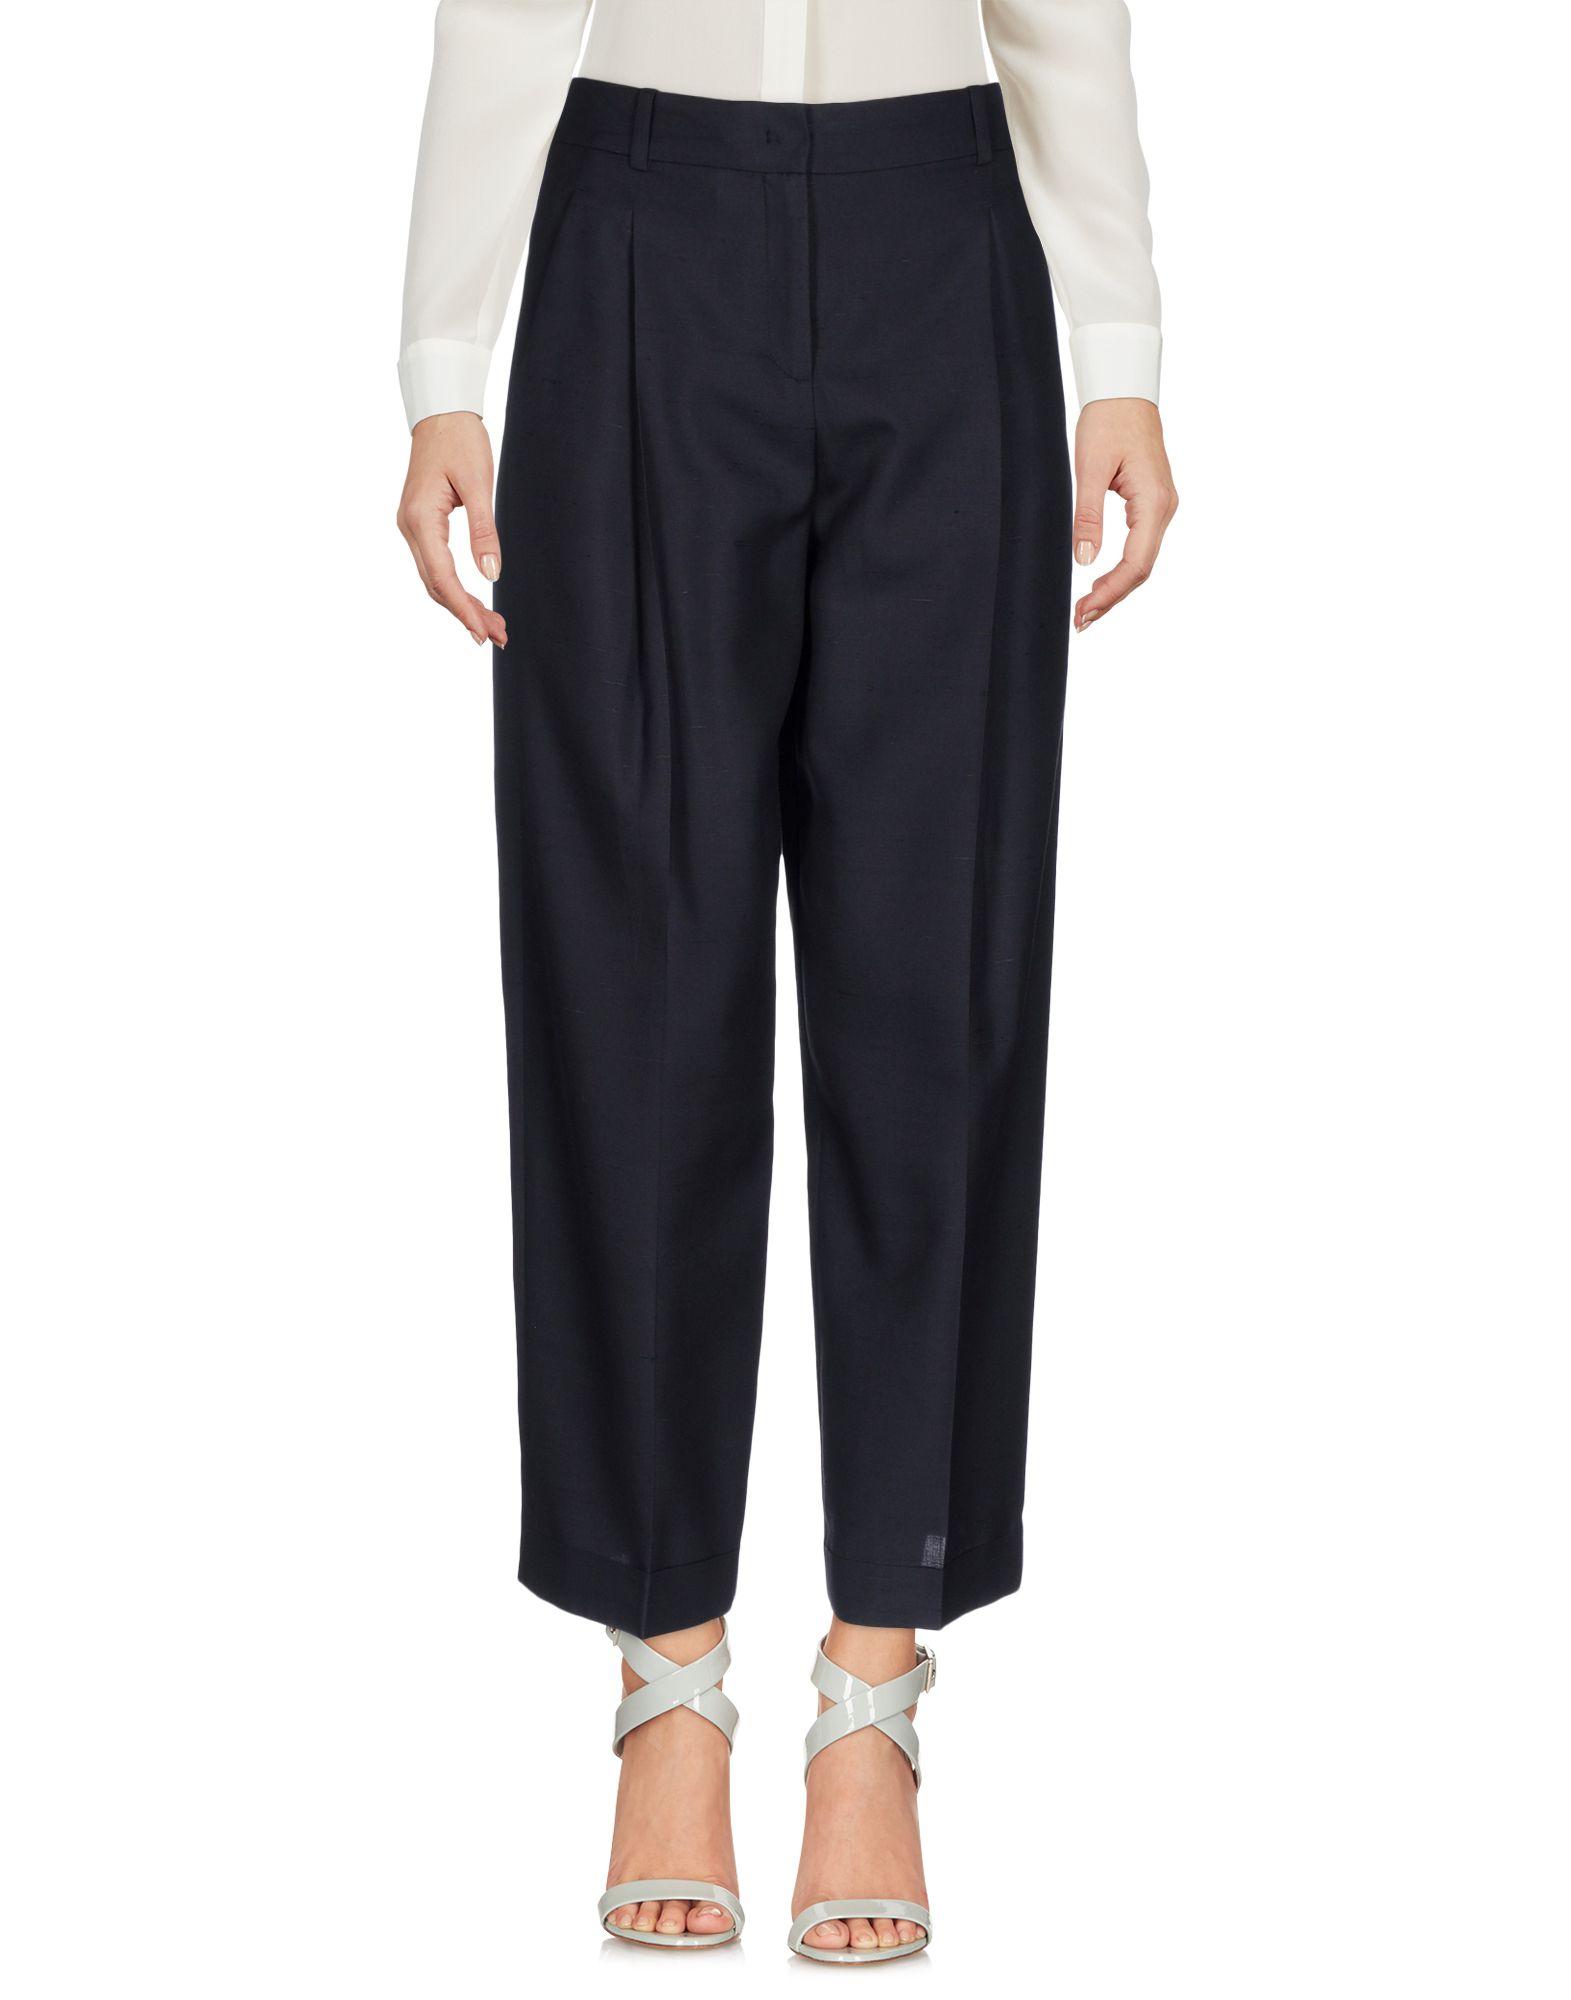 Pantalone Jil Sander Navy Donna - Acquista online su